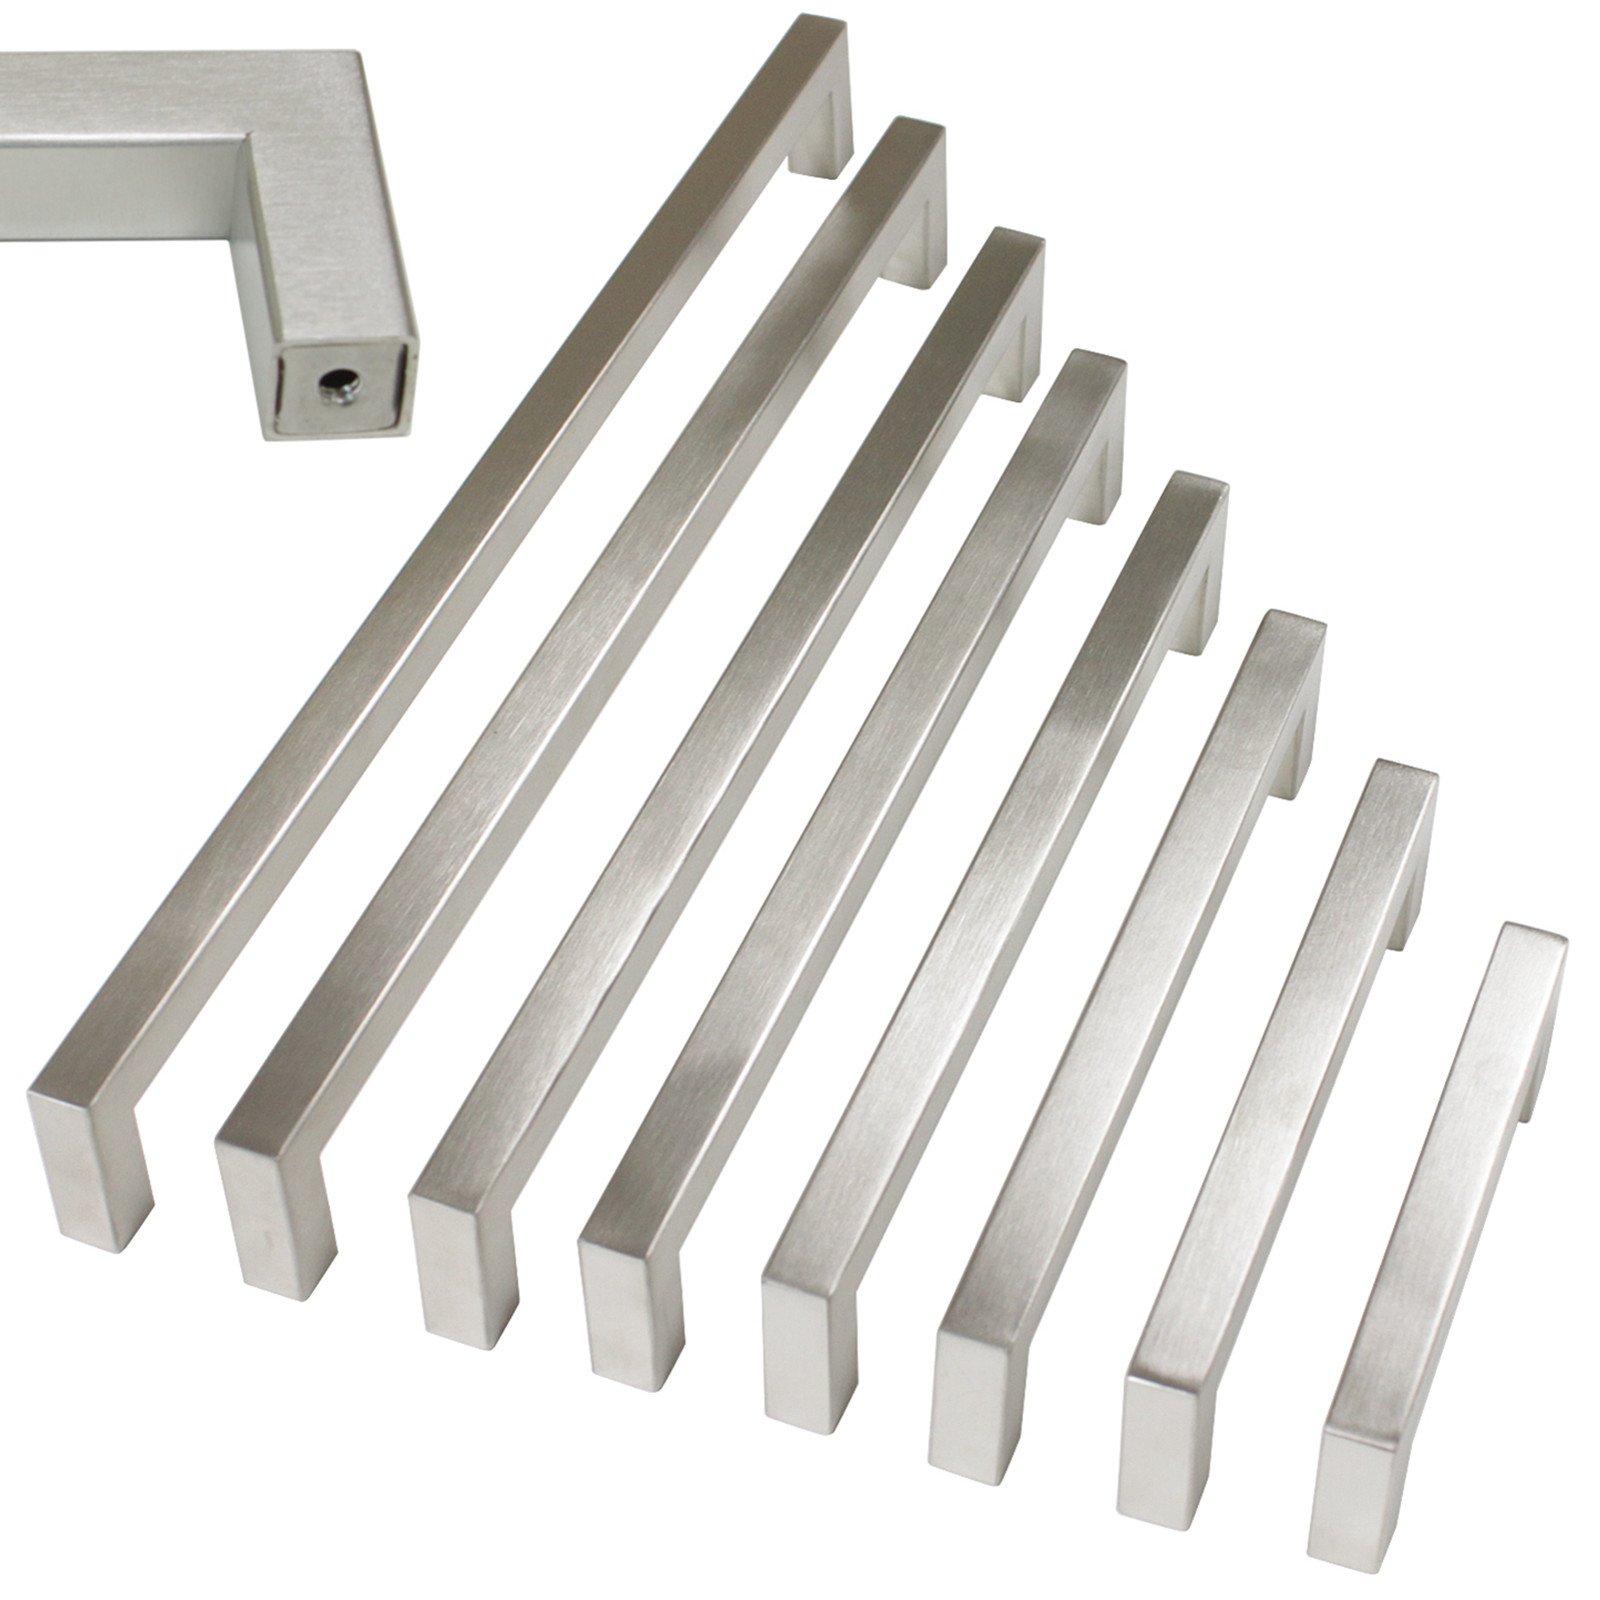 50 pack Probrico 1/2 in Stainless Steel Square Corner Bar Kitchen Cabinet Door Handles Brusehd Satin Nickel Hole Centers 6-1/4 inch 160mm